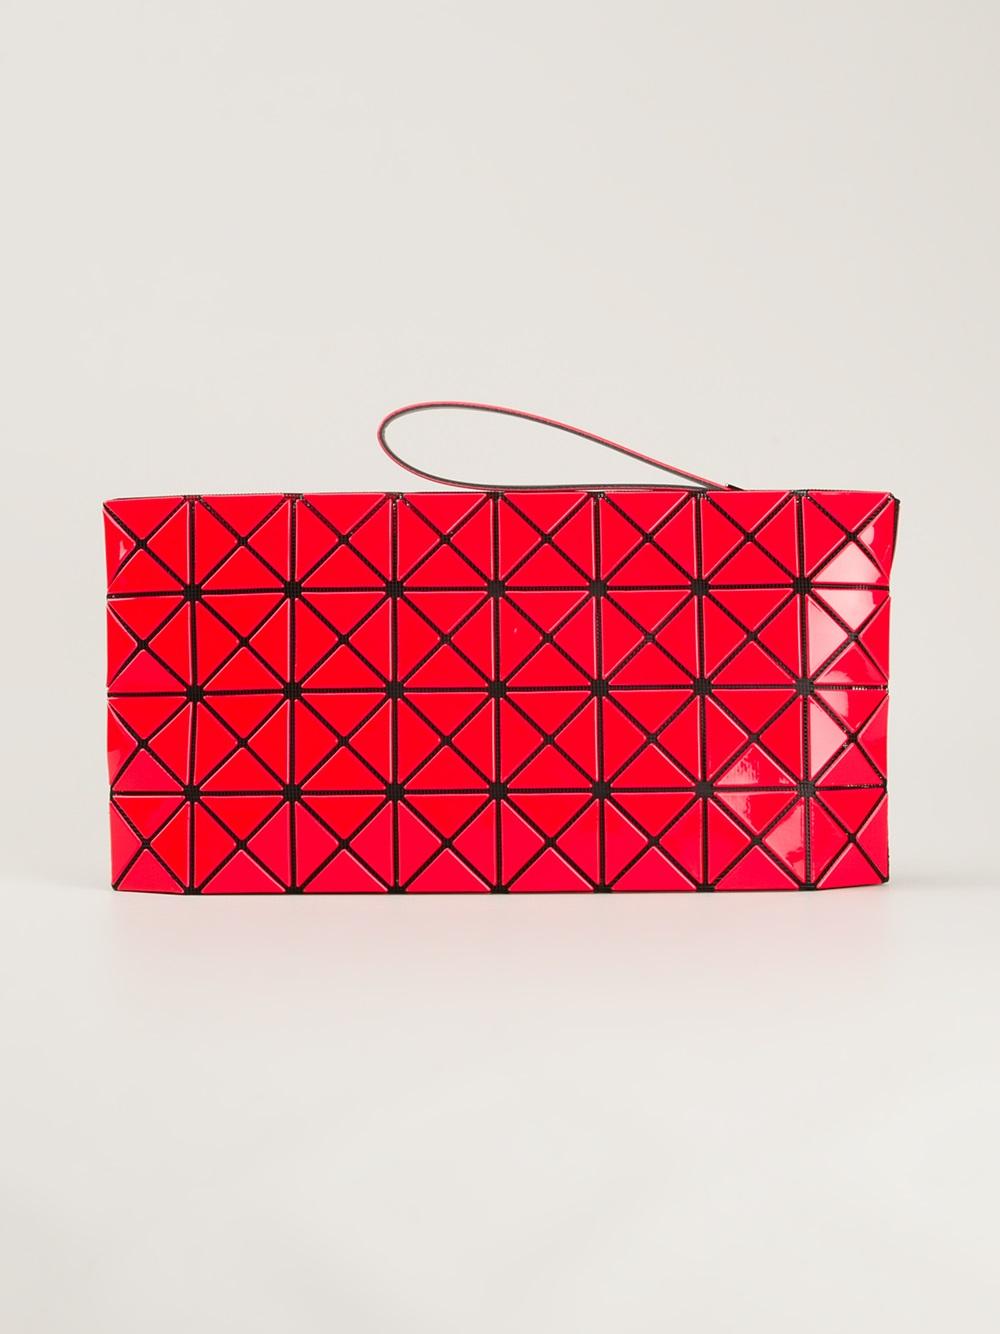 Lyst Bao Bao Issey Miyake Clutch Bag In Red